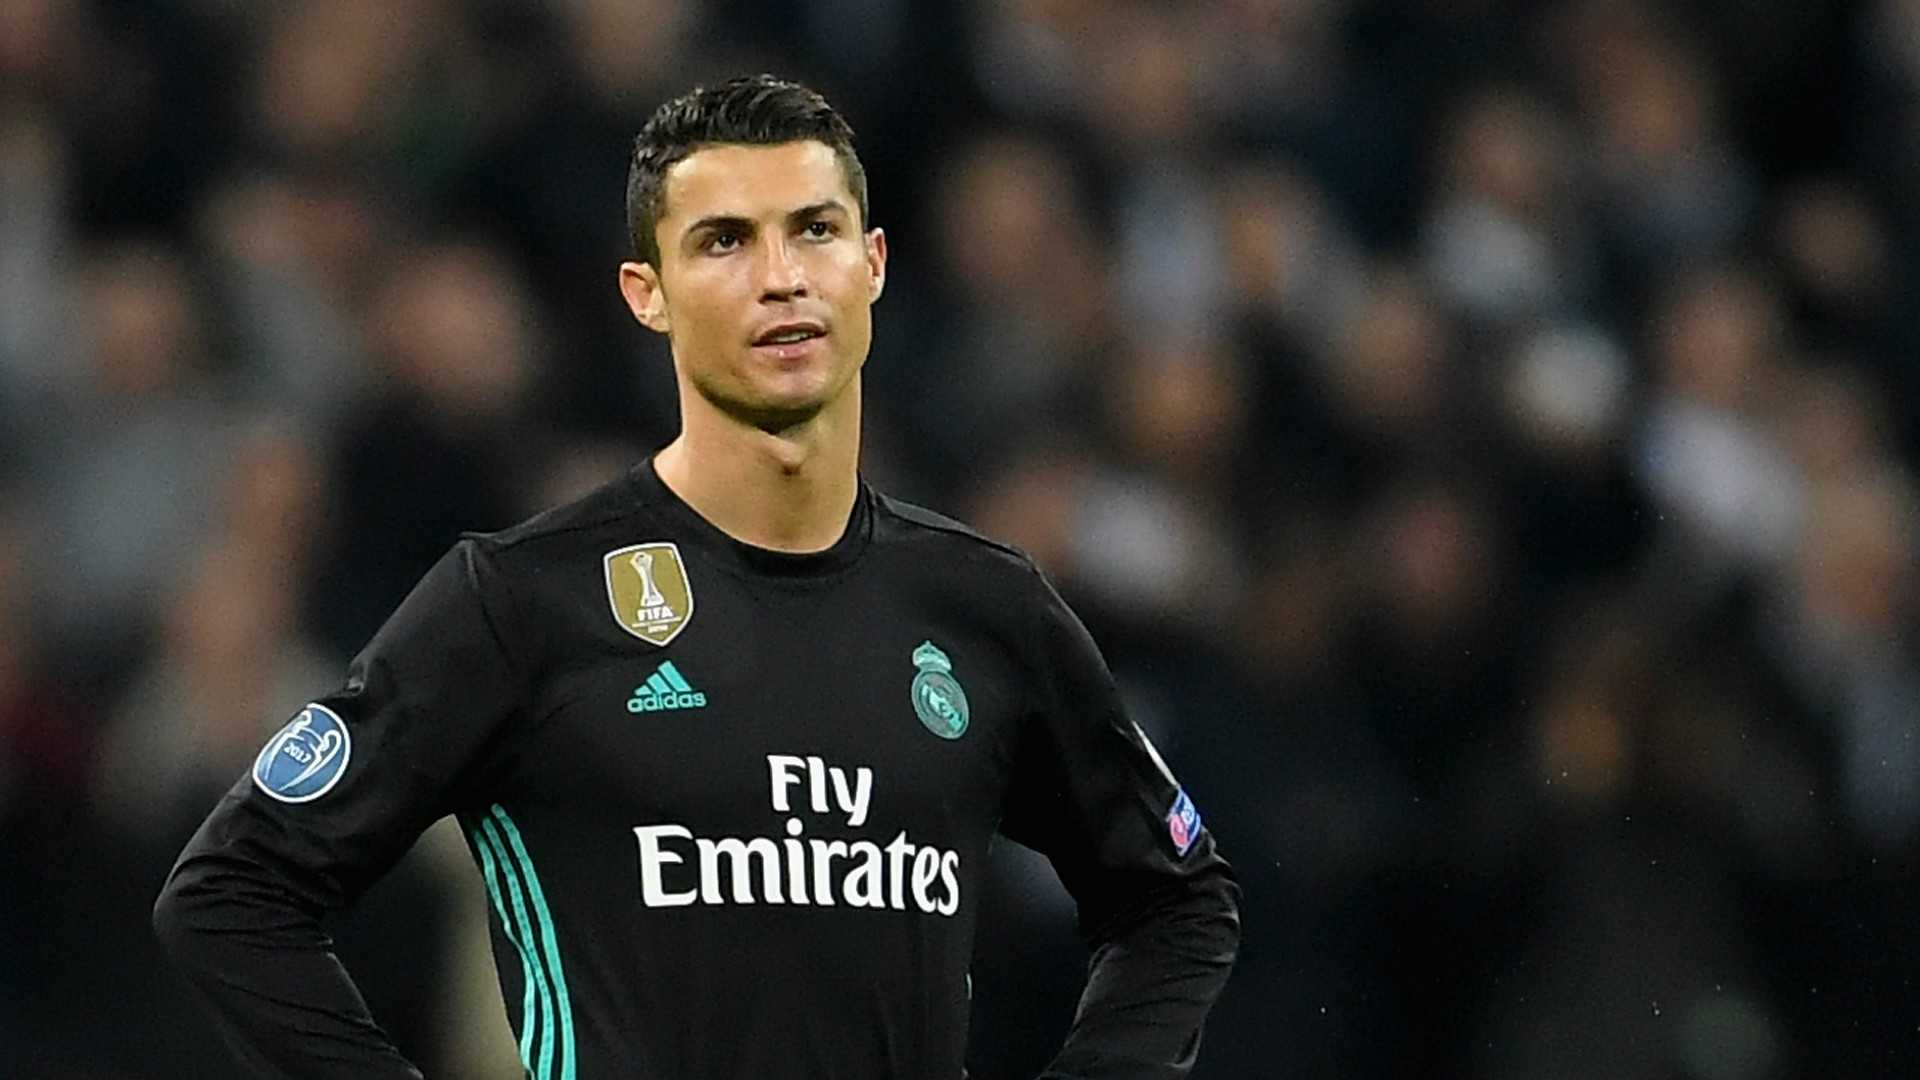 1920x1080 Cristiano Ronaldo Hình nền HD